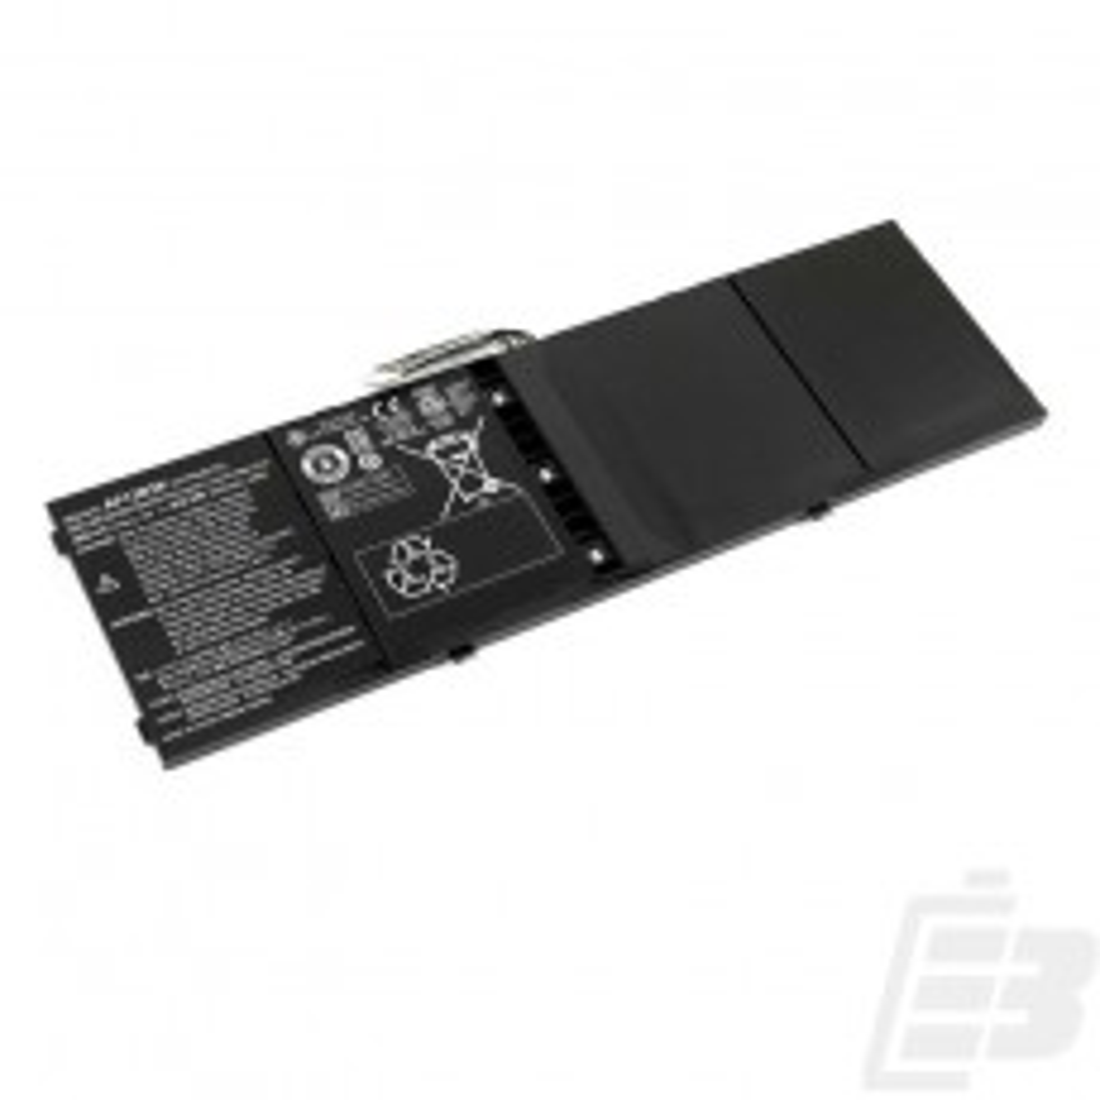 Laptop battery Acer Aspire V5-573_1